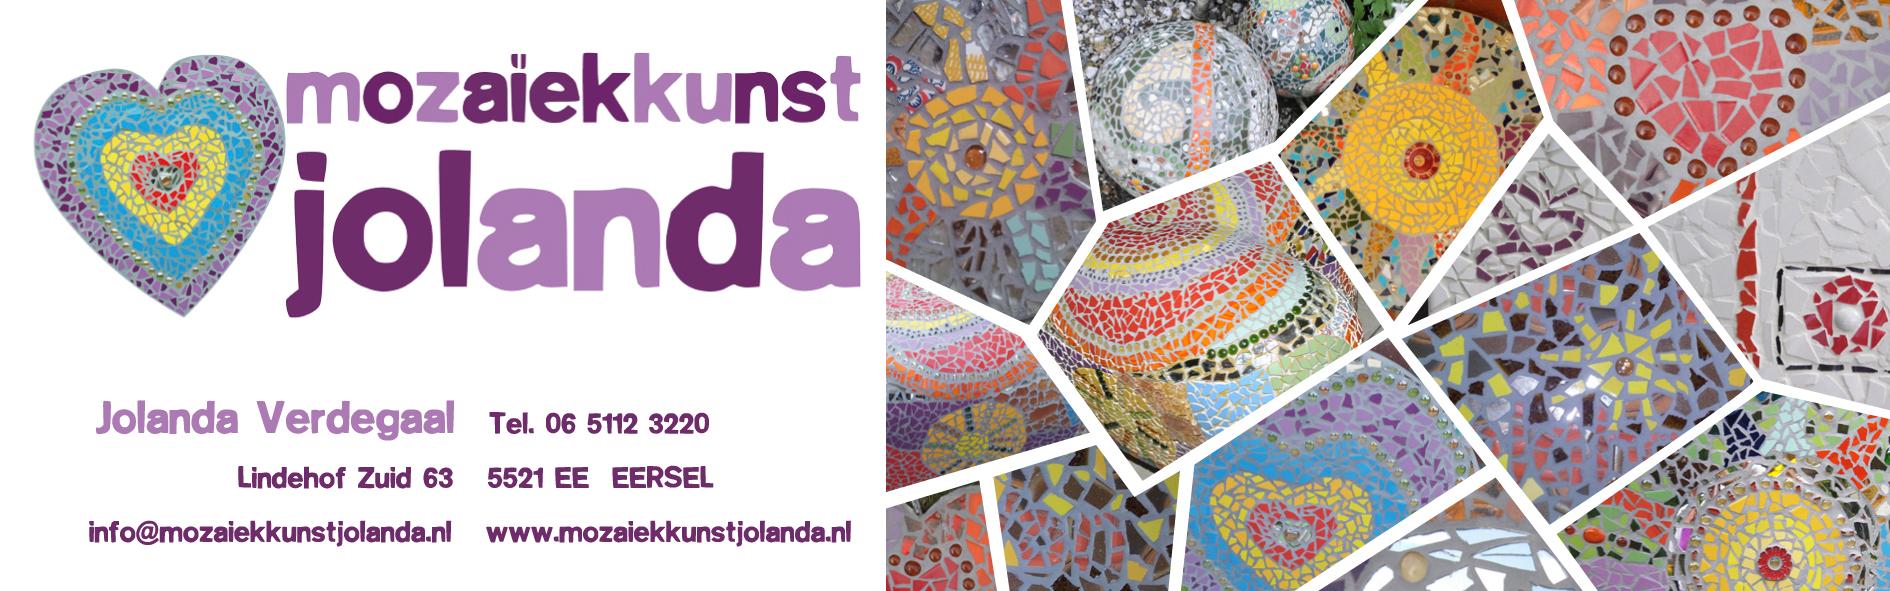 Mozaiekkunst Jolanda